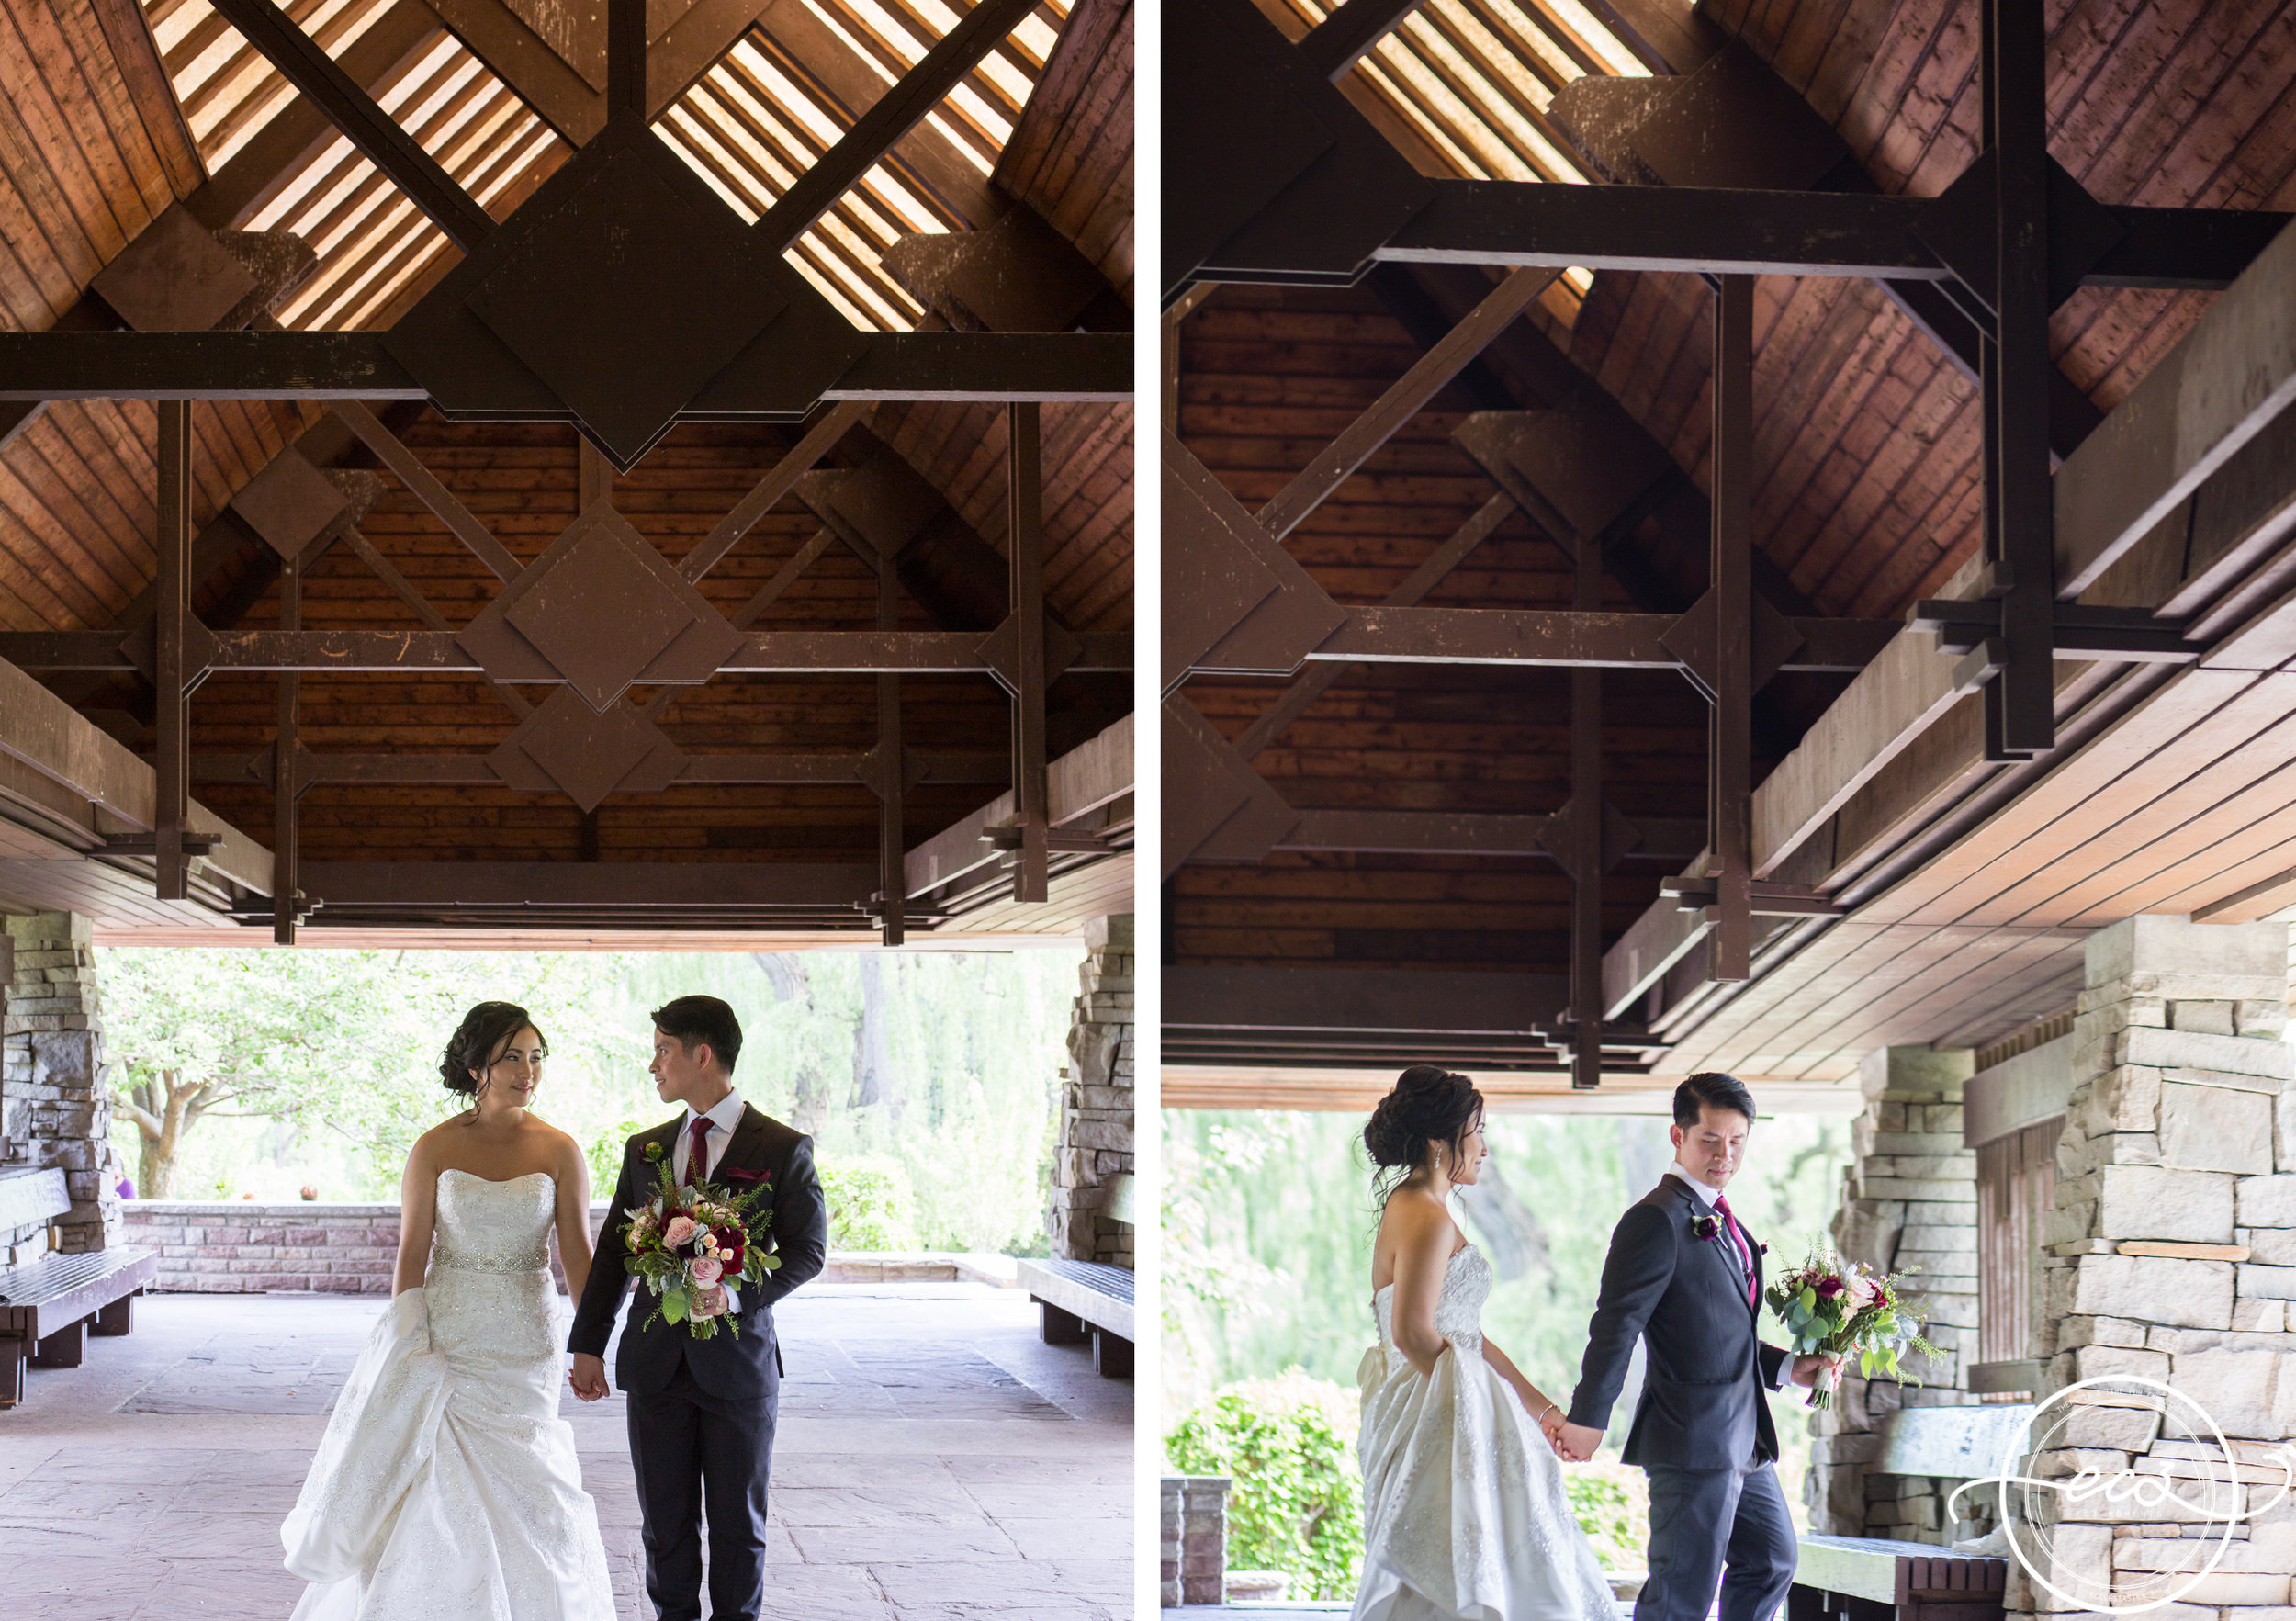 Toronto Edwards Garden and Intimate Vietnamese Wedding18.jpg